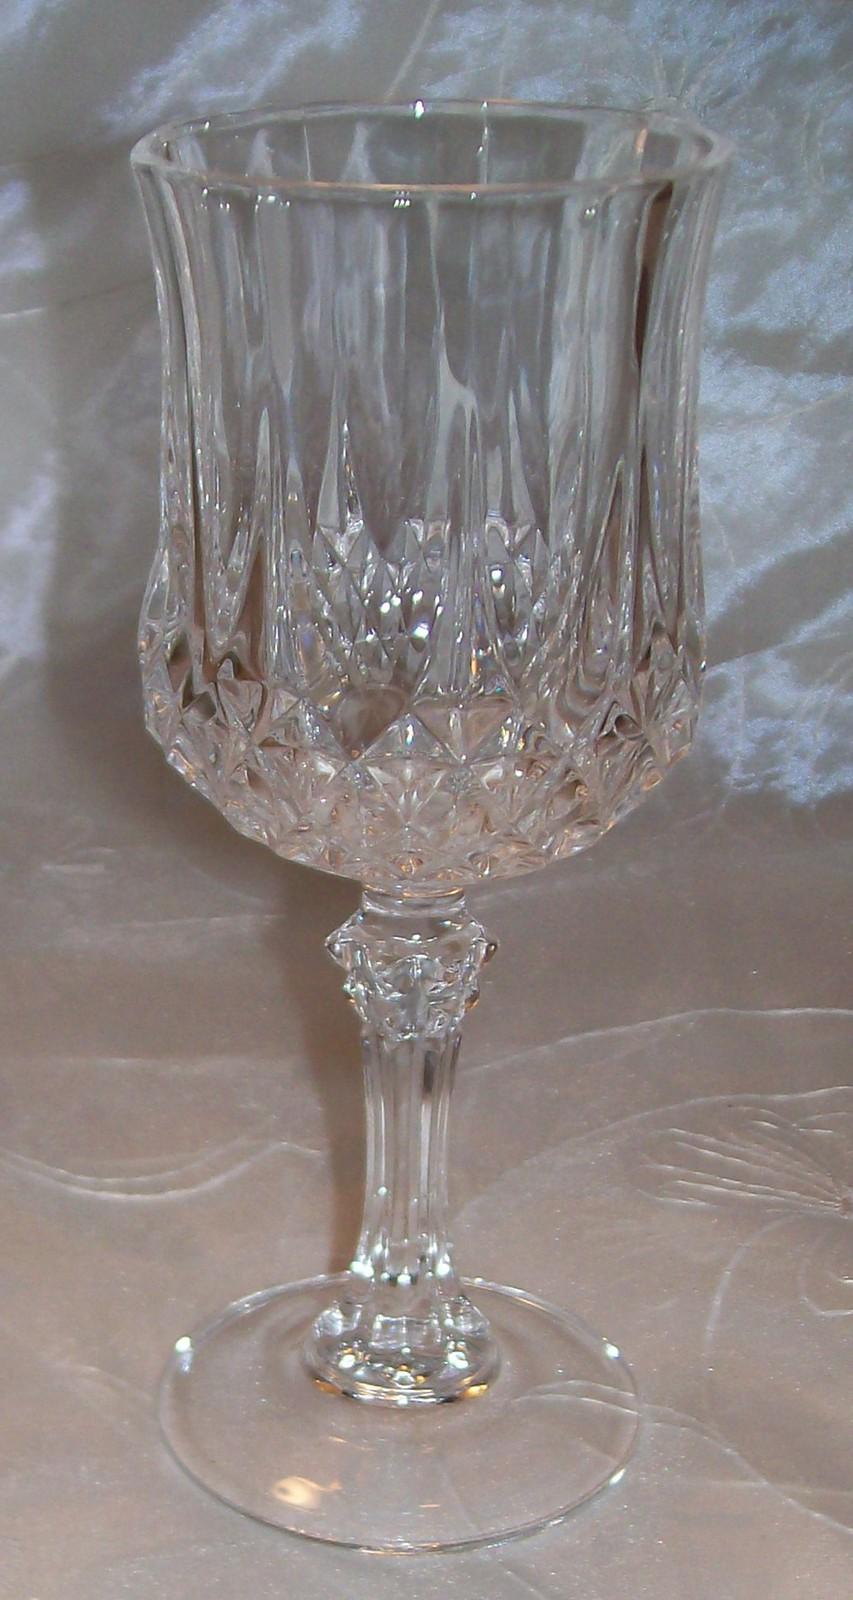 cristal d 39 arques crystal stemware longchamp wine glass 6. Black Bedroom Furniture Sets. Home Design Ideas